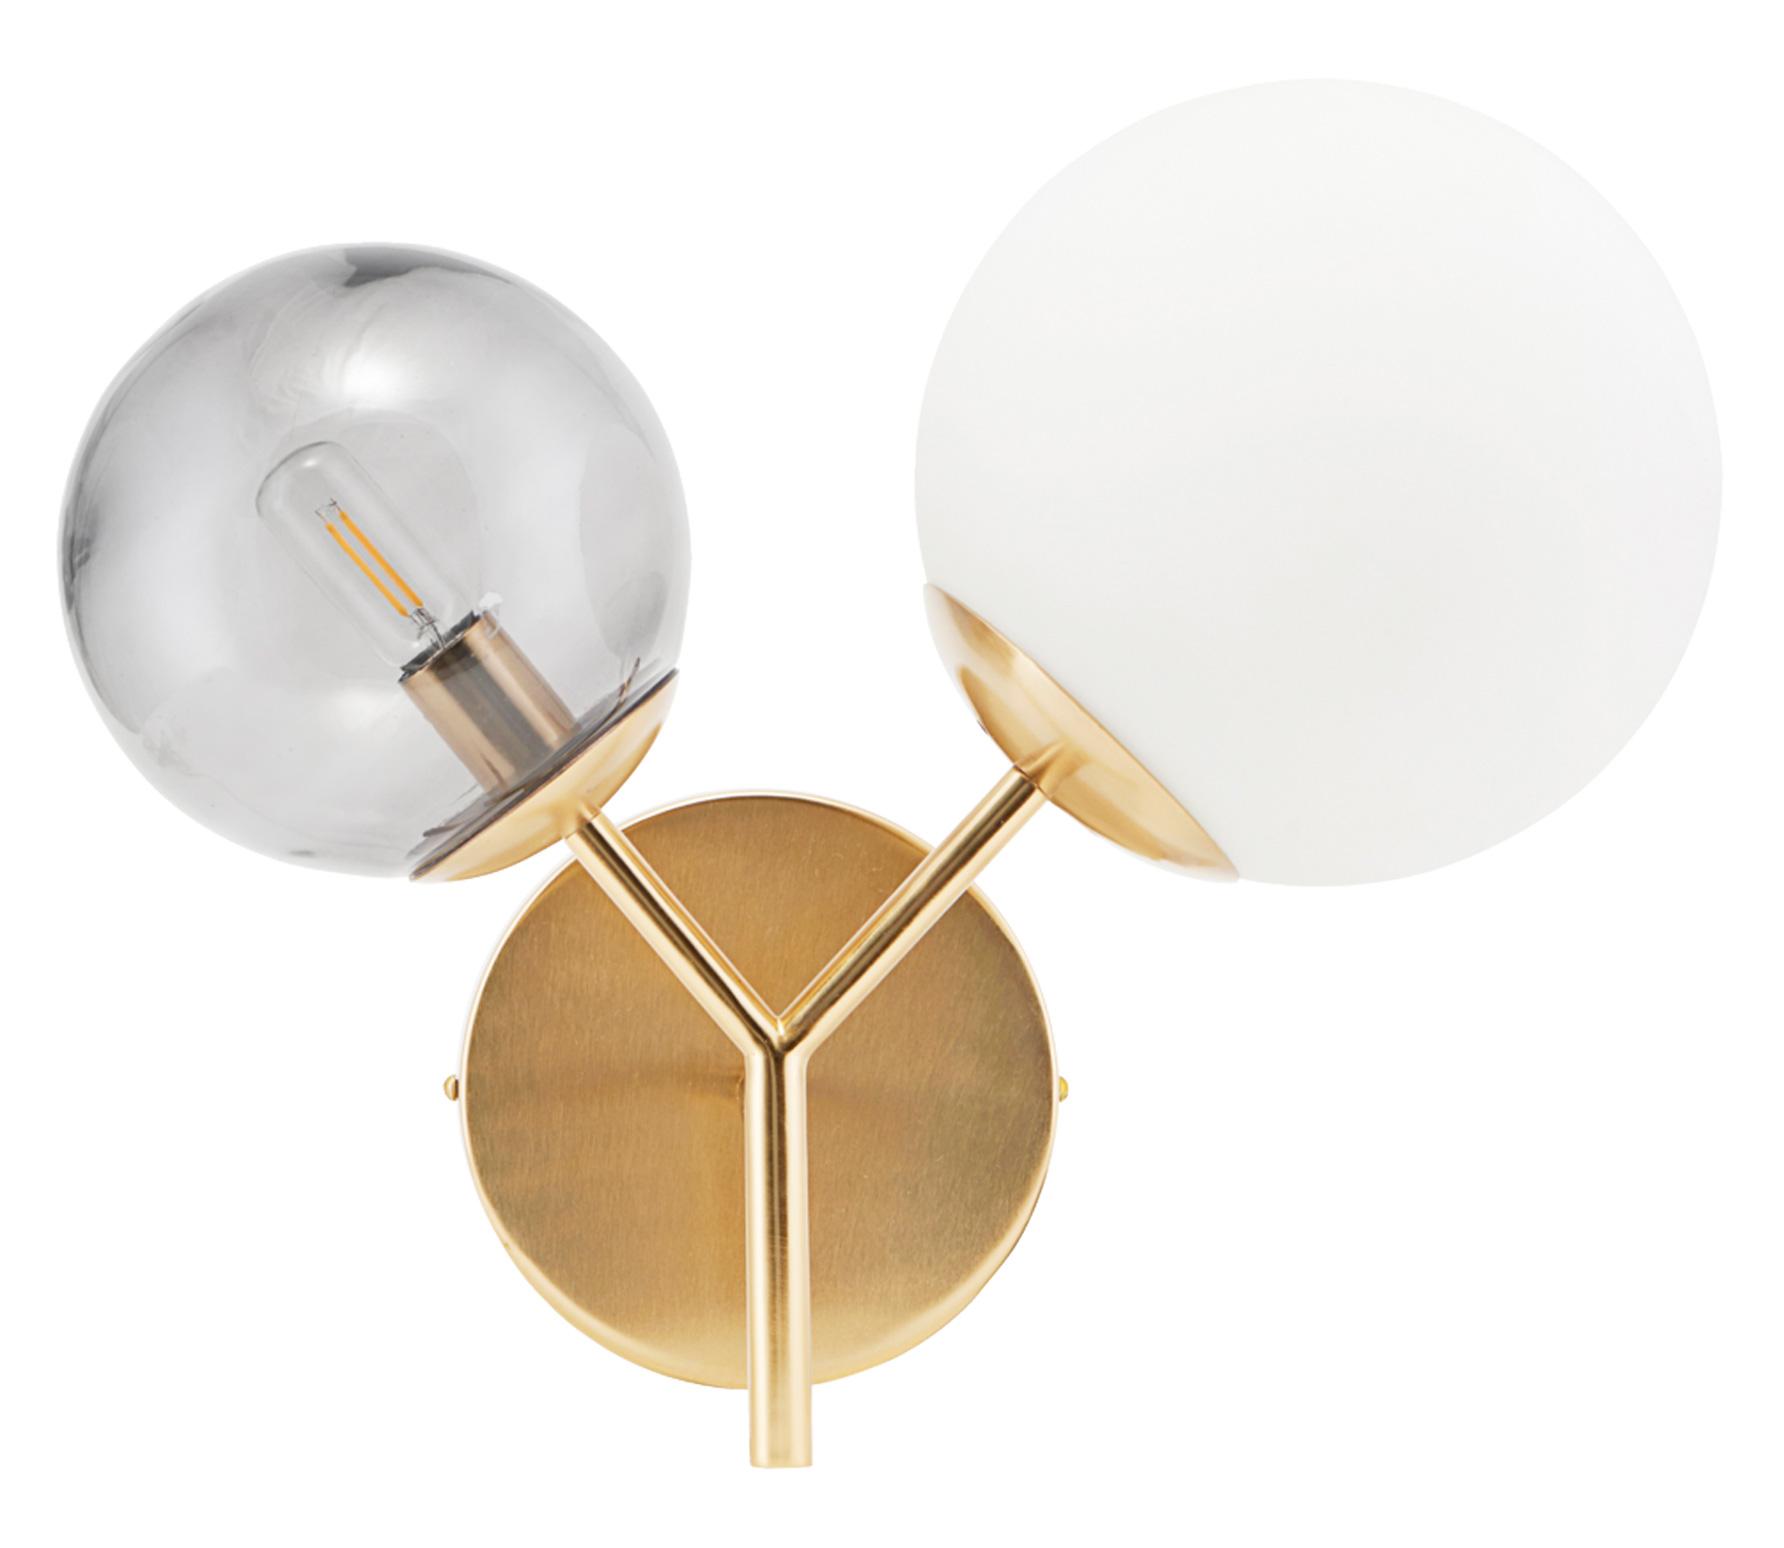 Housedoctor Twice wandlamp brass brass finish